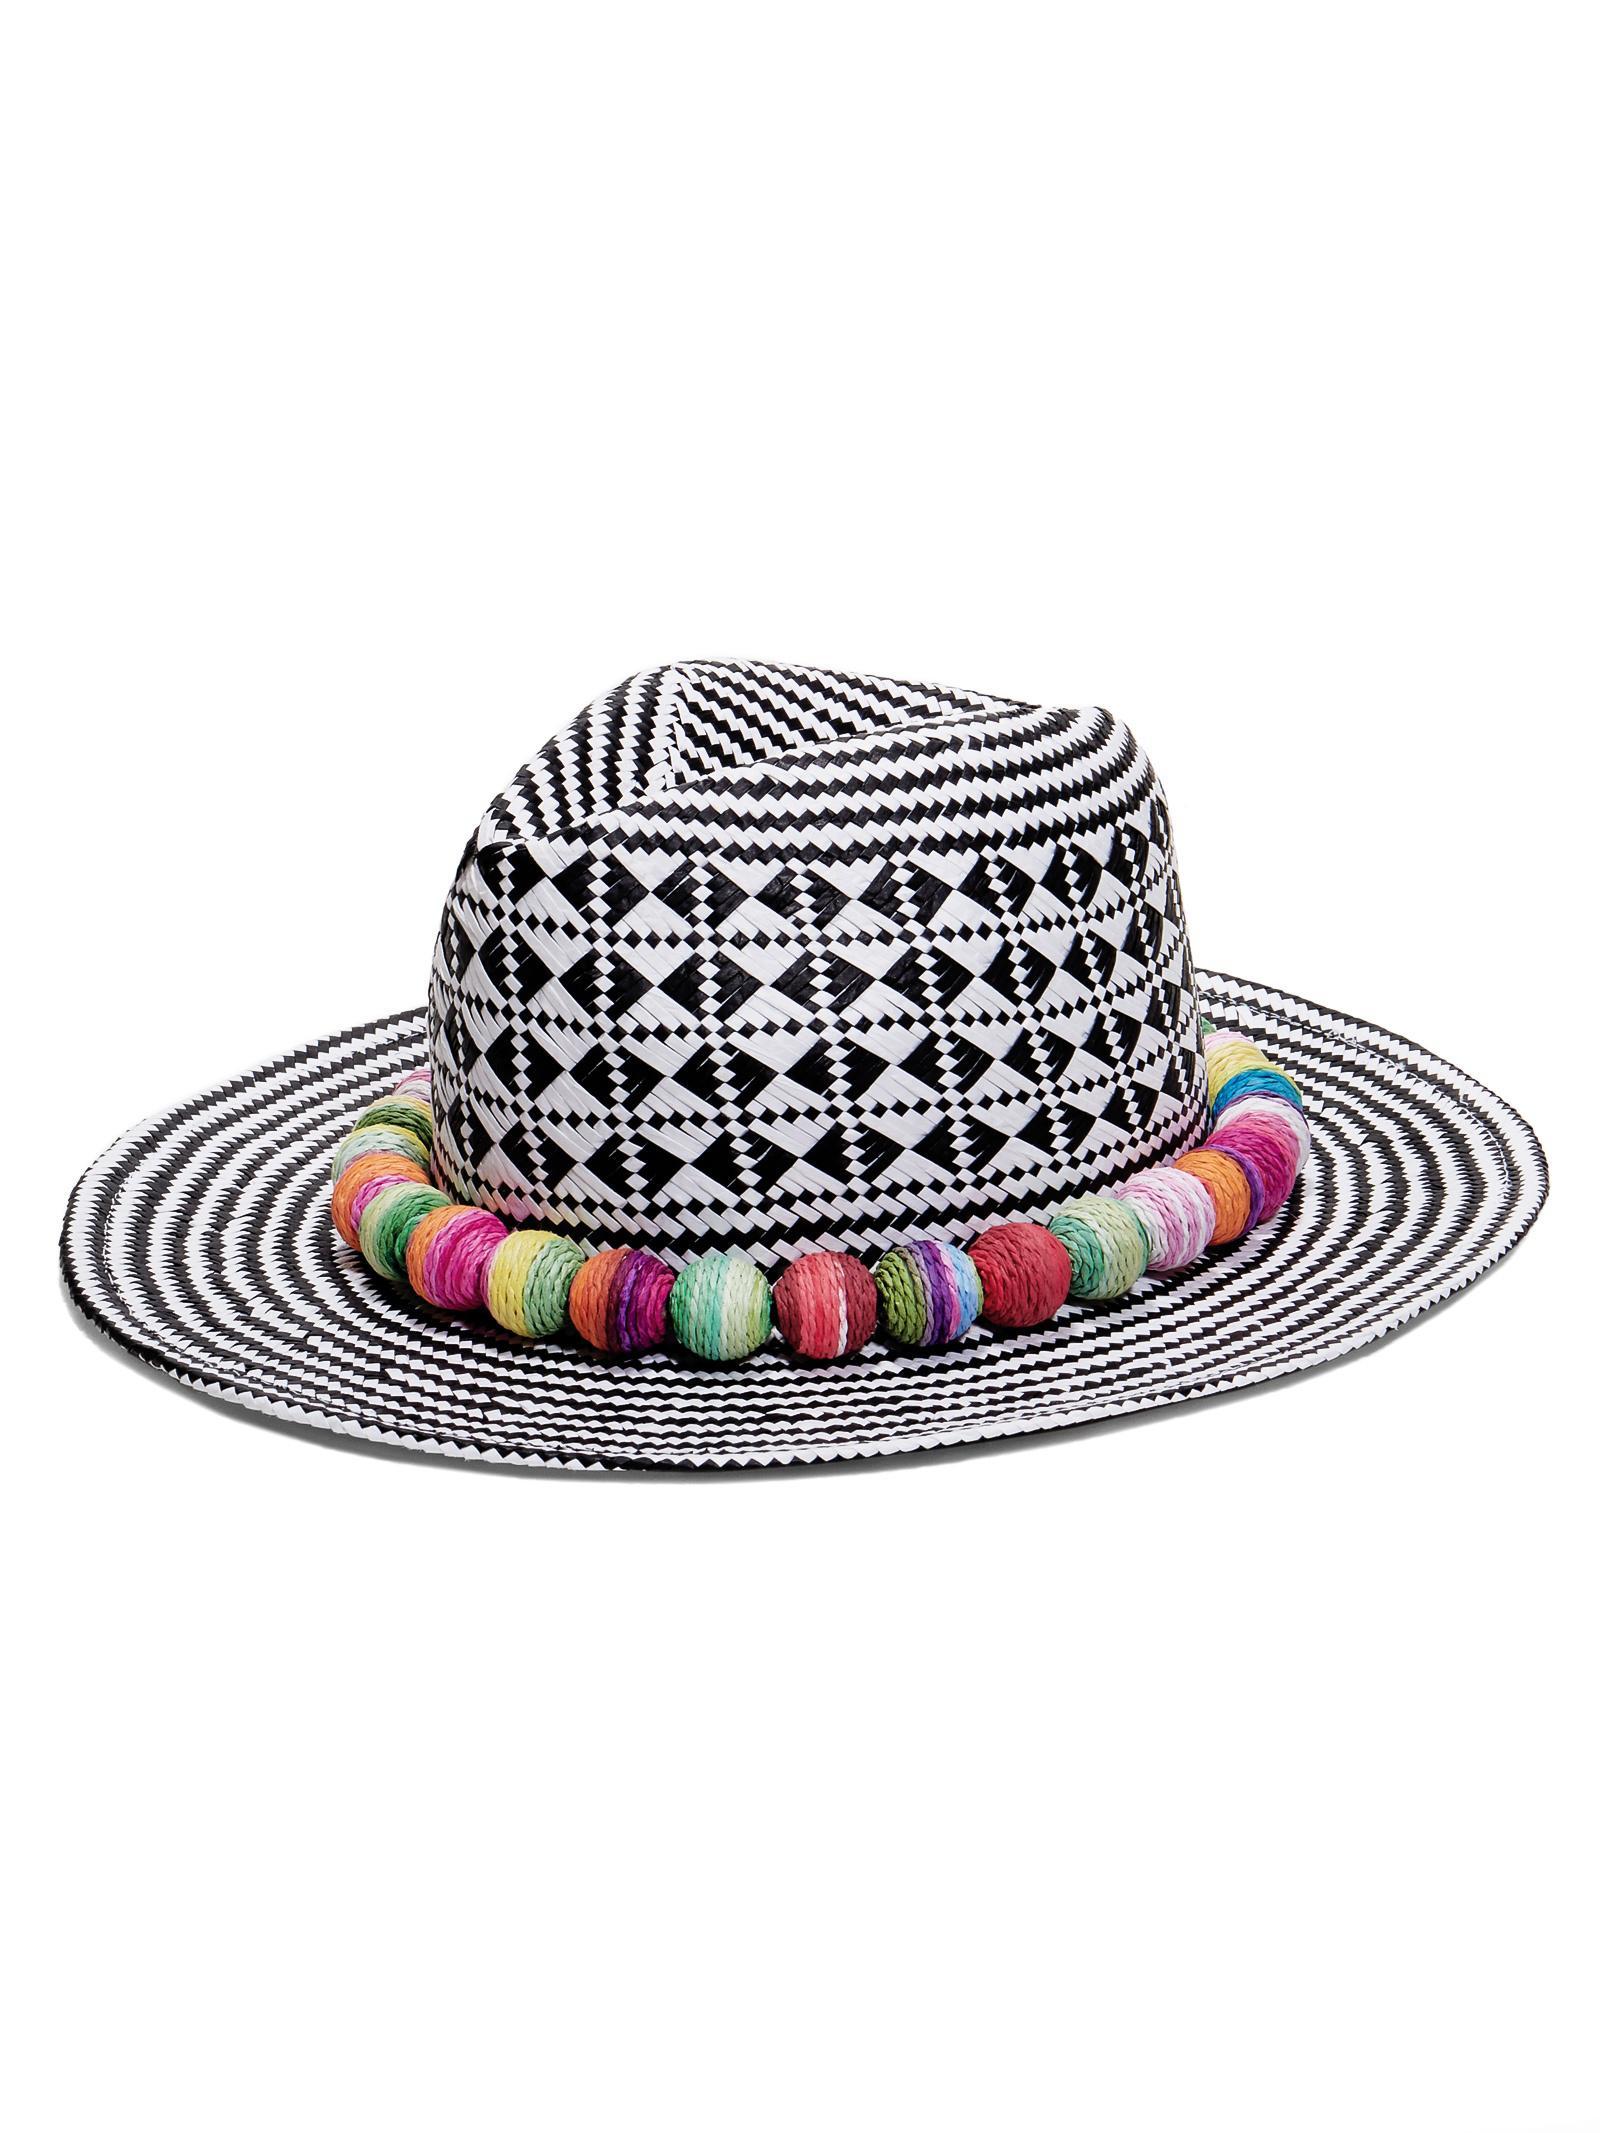 Lyst - Baublebar Lara Fedora Hat